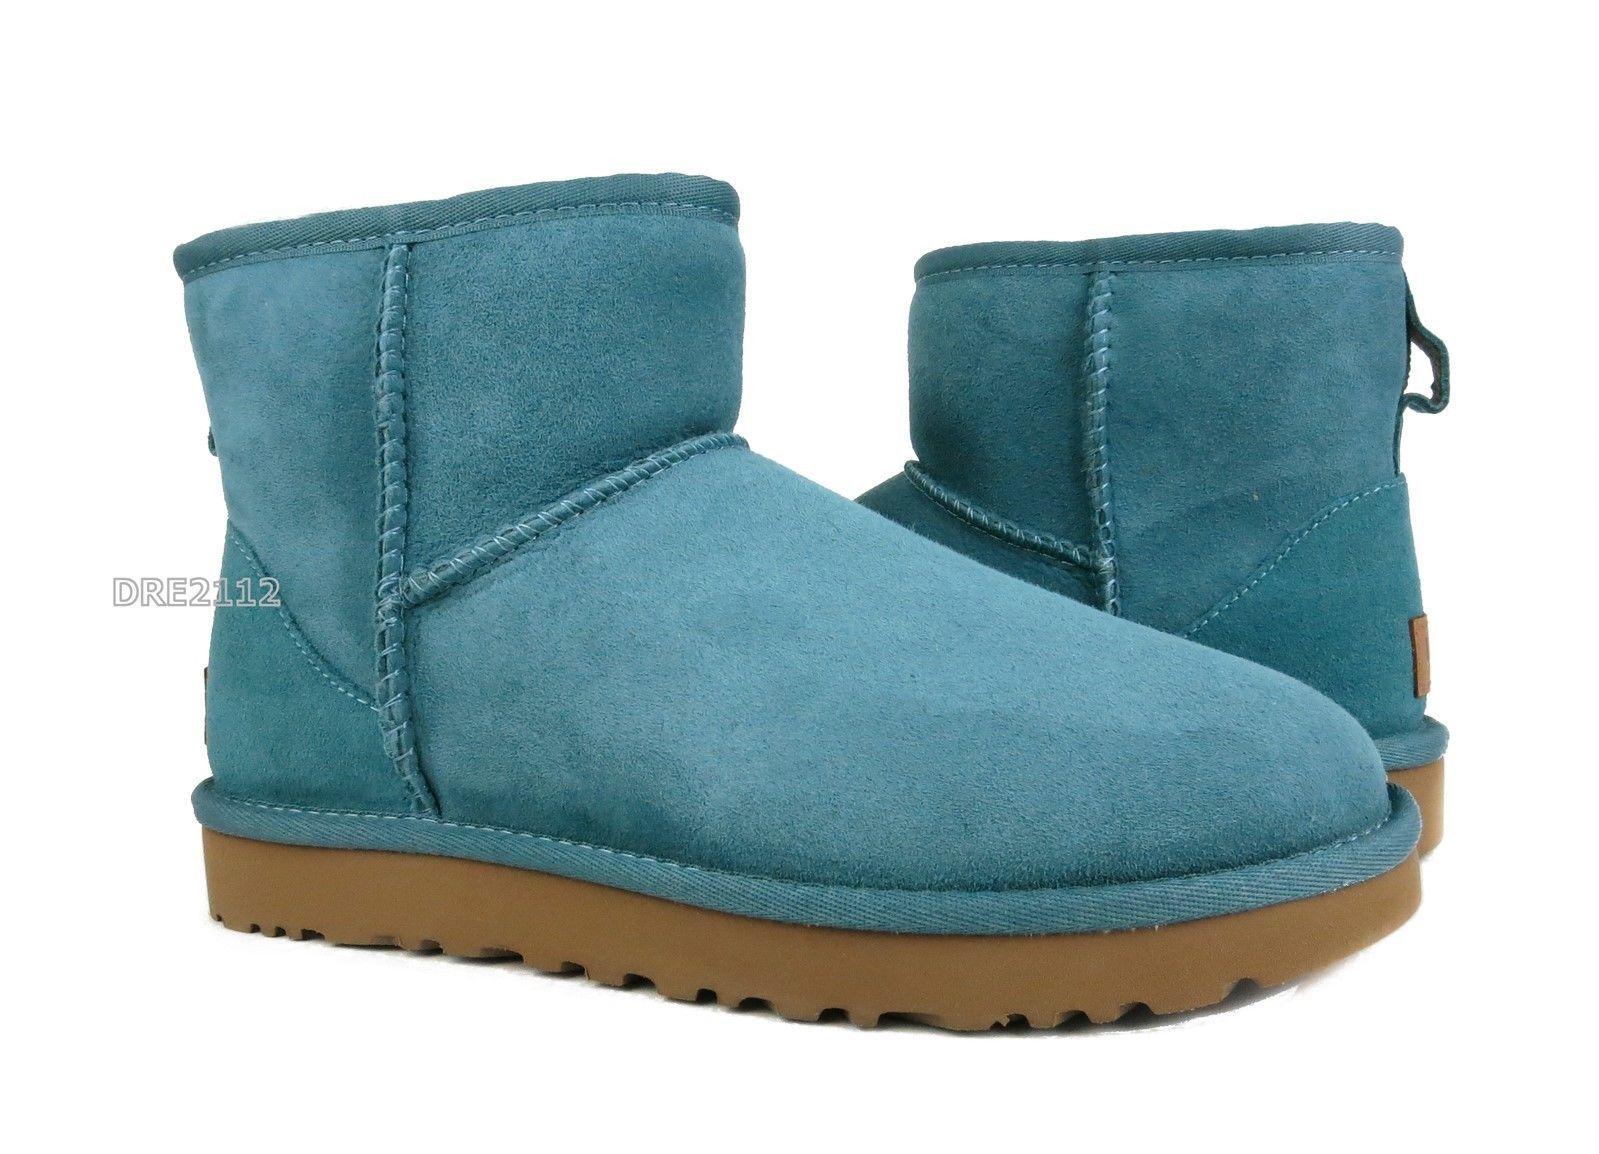 d9a0de564ae 92.36   UGG Classic Mini II Cascade Blue Suede Fur Boots Womens Size ...